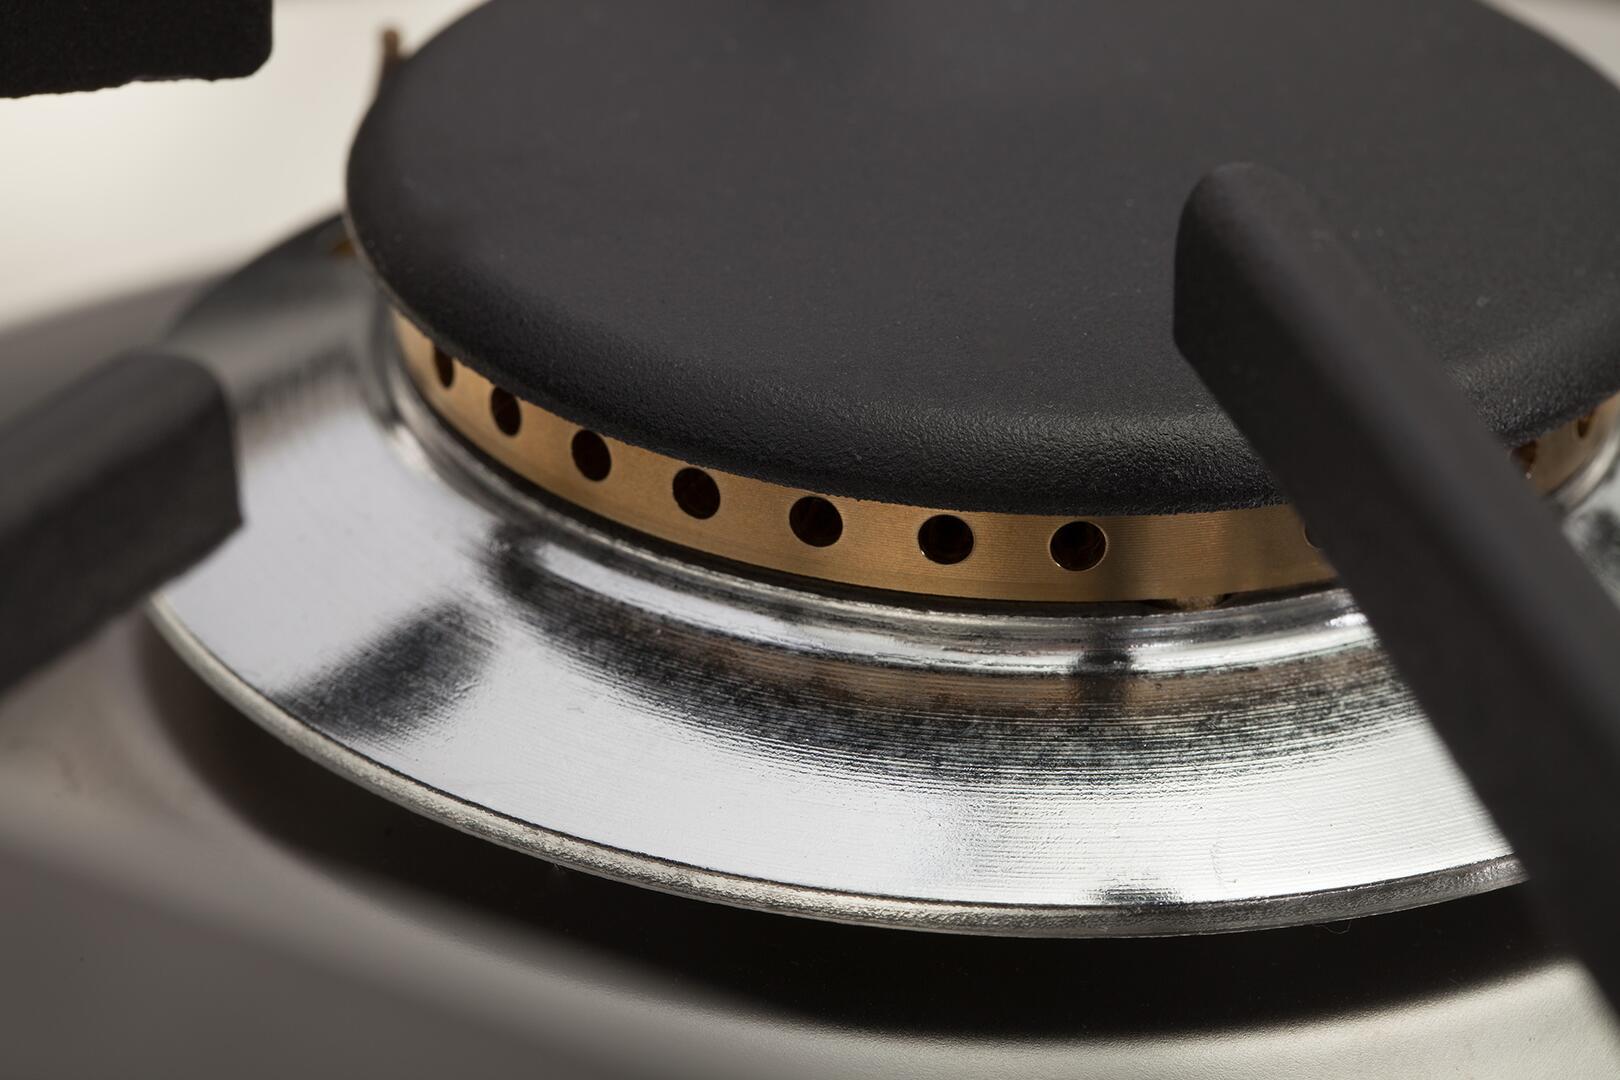 Ilve Professional Plus UPDW100FDMPMLP Freestanding Dual Fuel Range Gray, 26